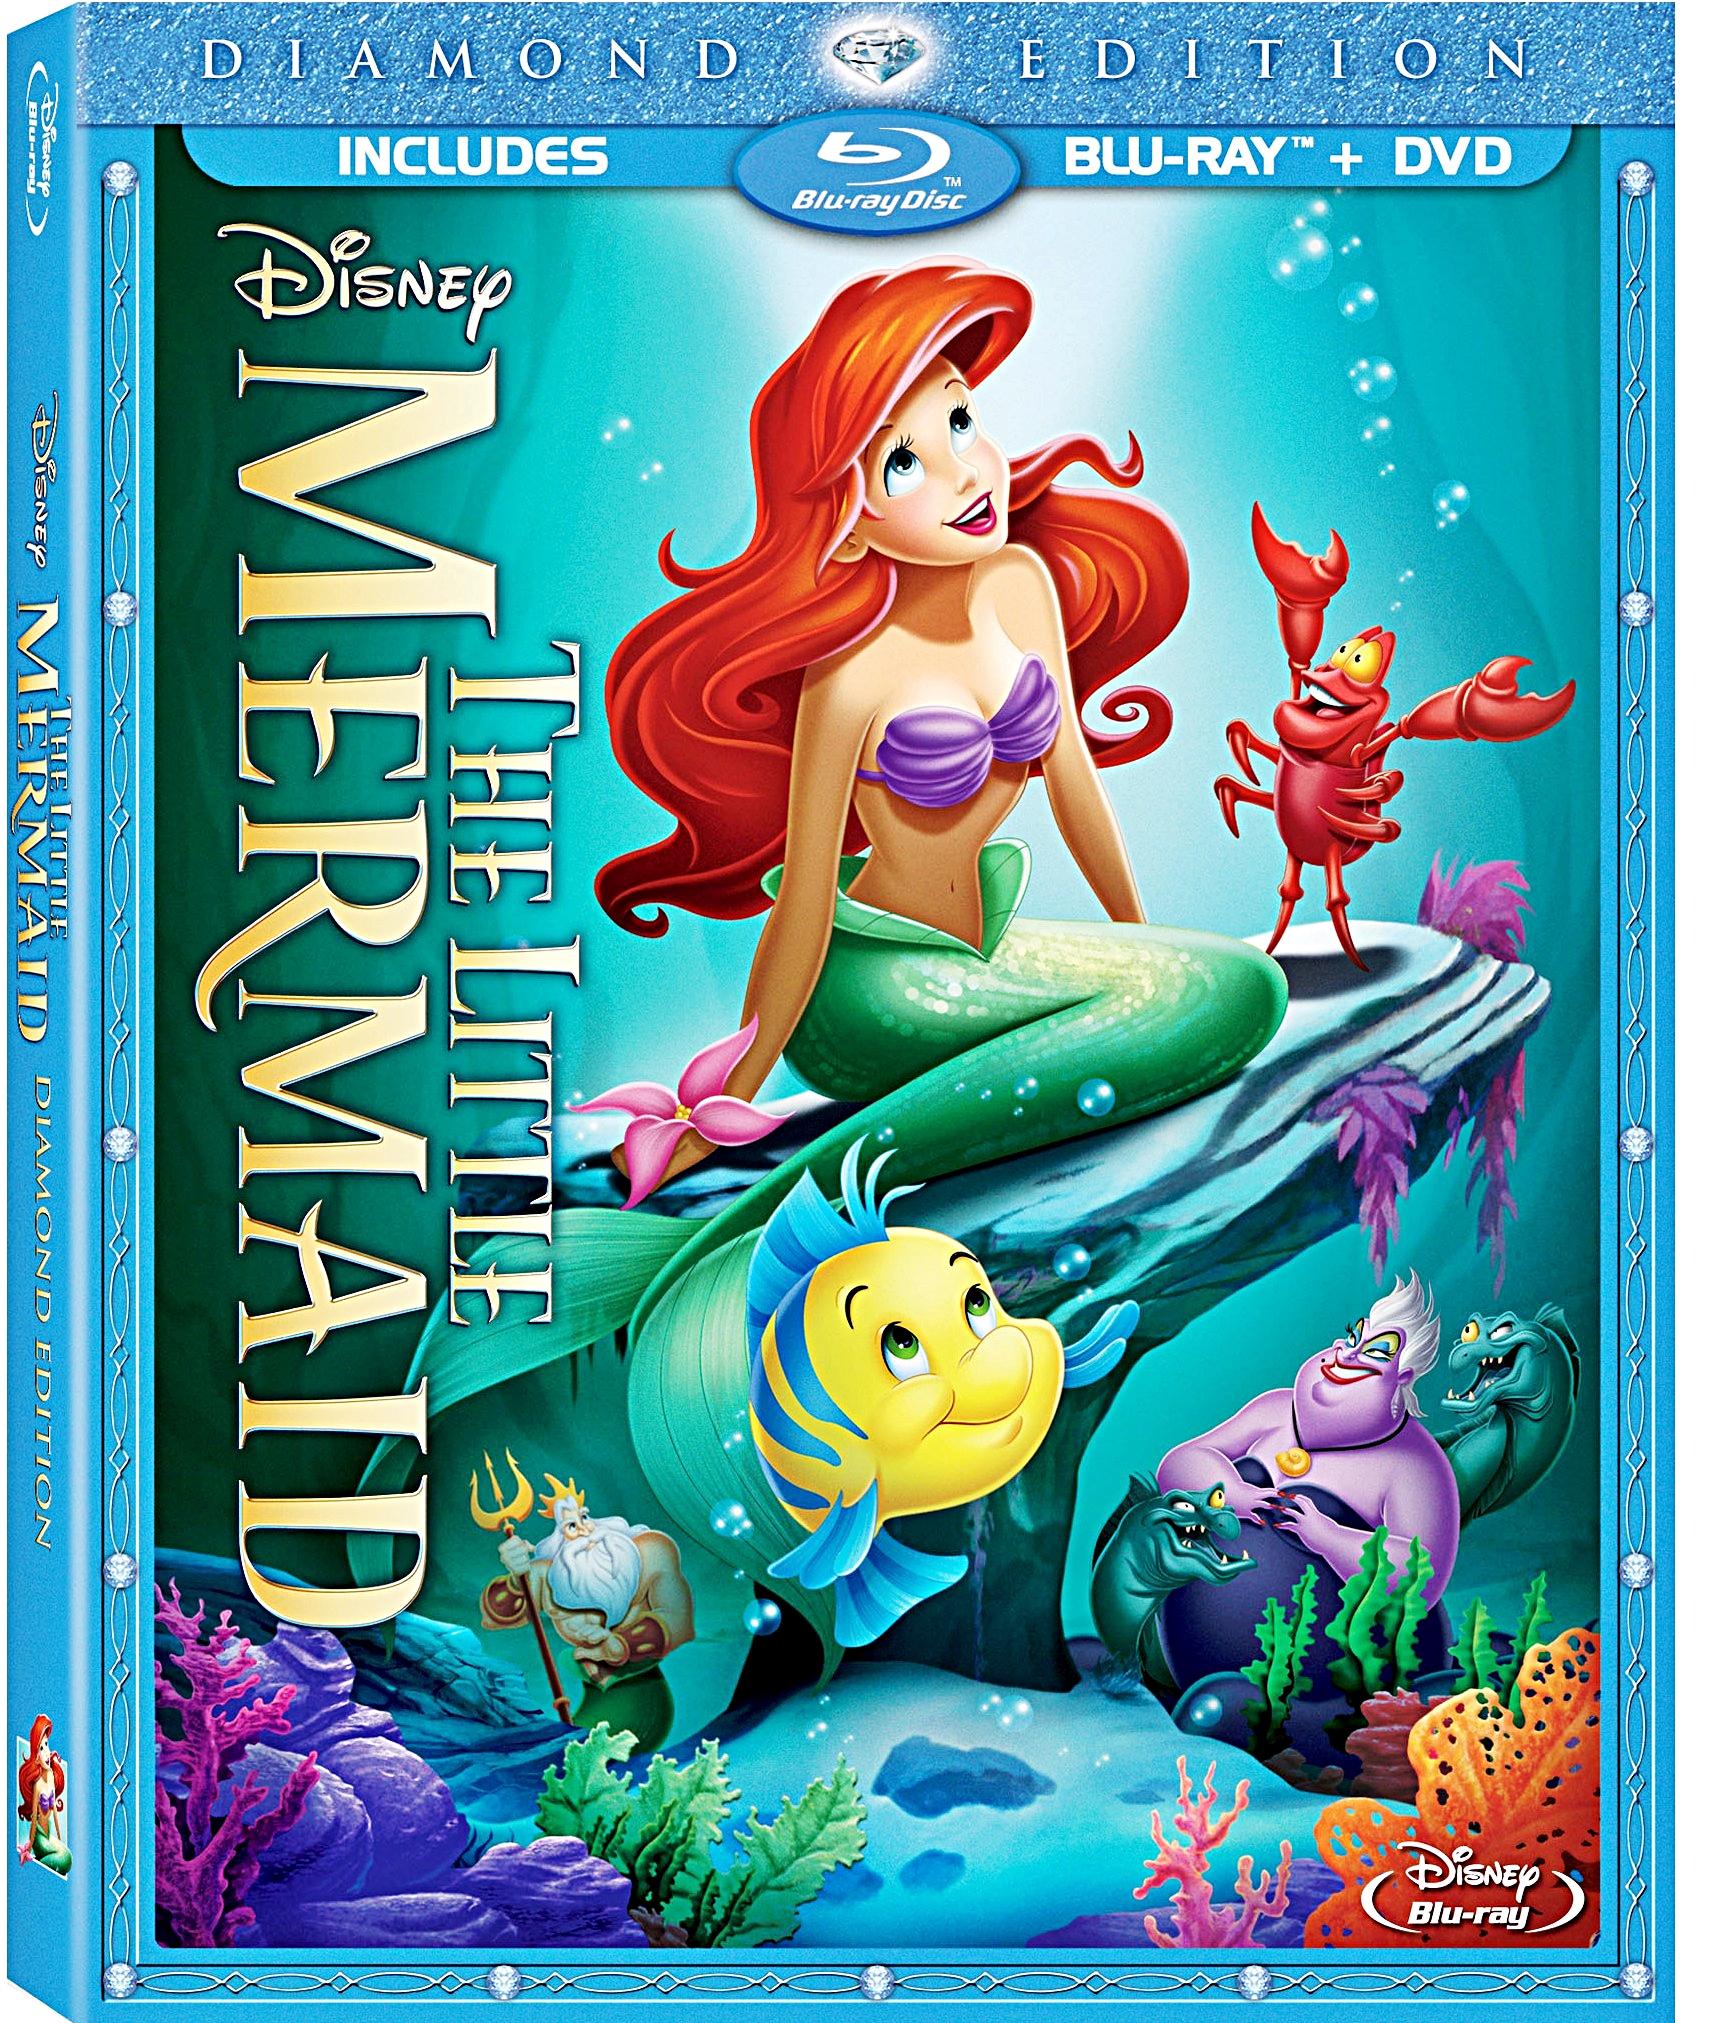 Edition Diamond: The-Little-Mermaid-Diamond-Edition-Blu-Ray-Cover